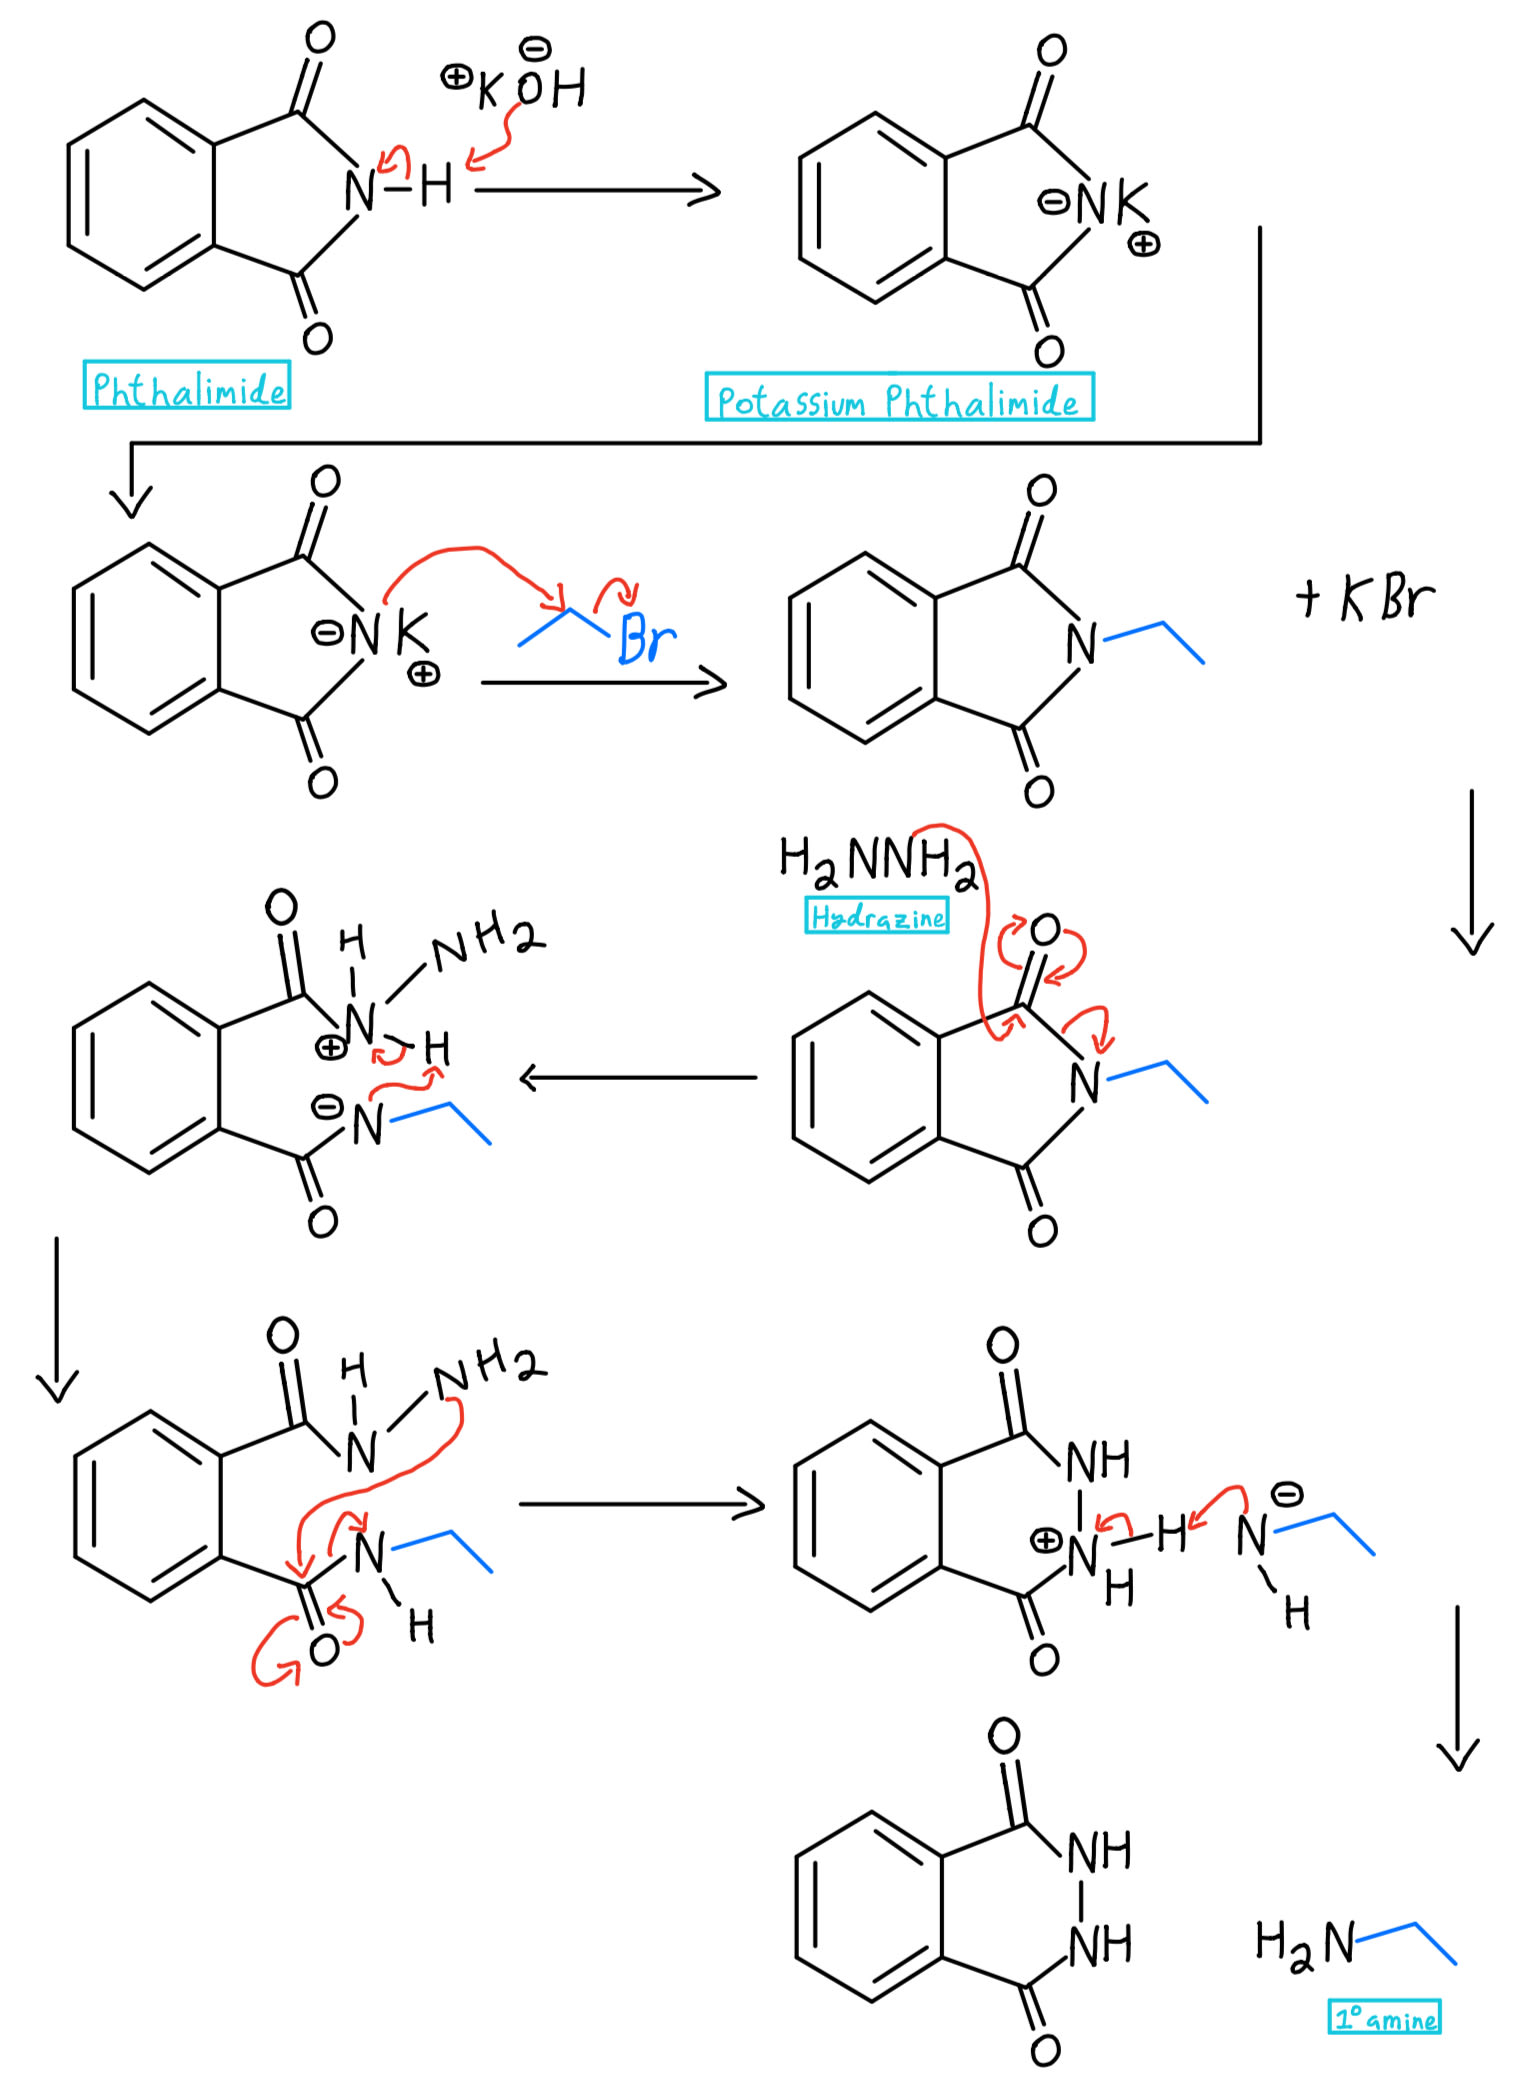 Hydrazine full mechanism